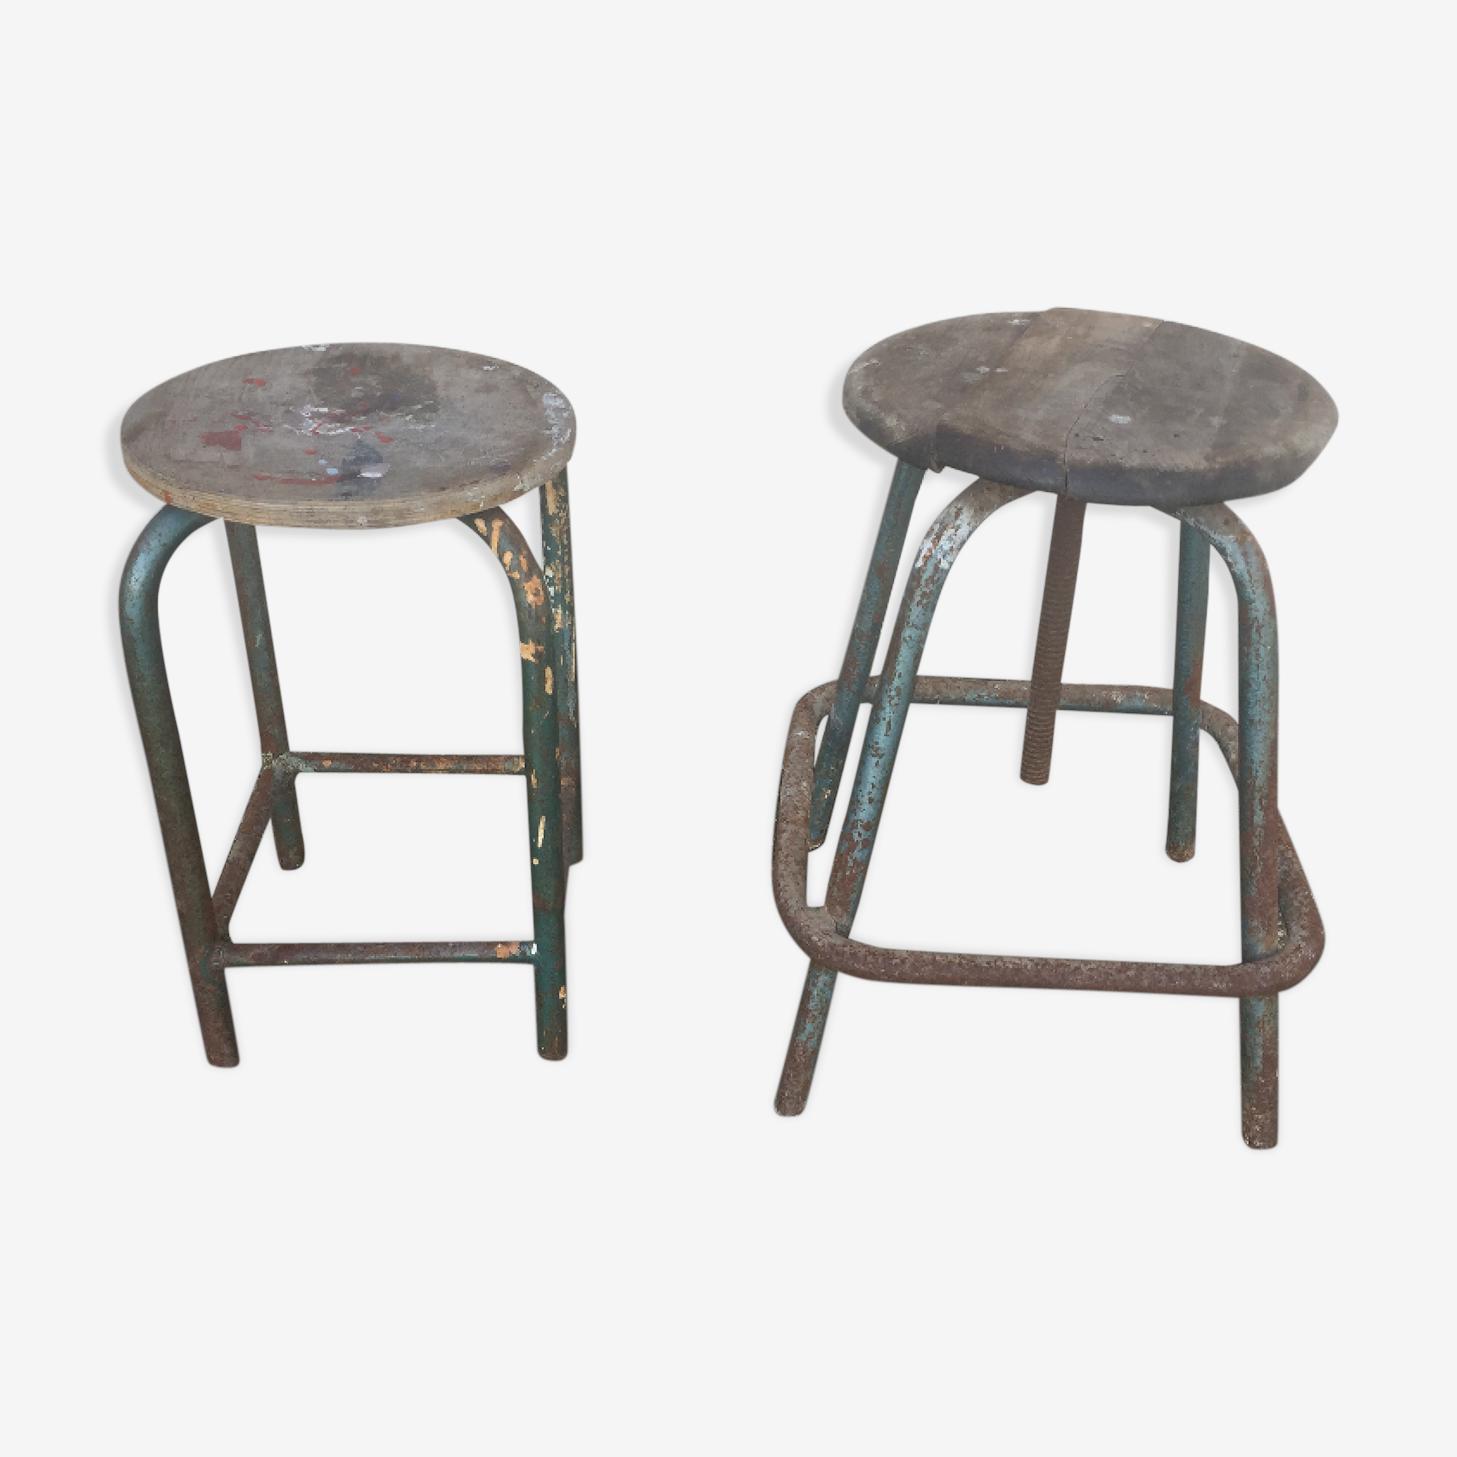 2 old STOOLS of workshop industrial years 50/60